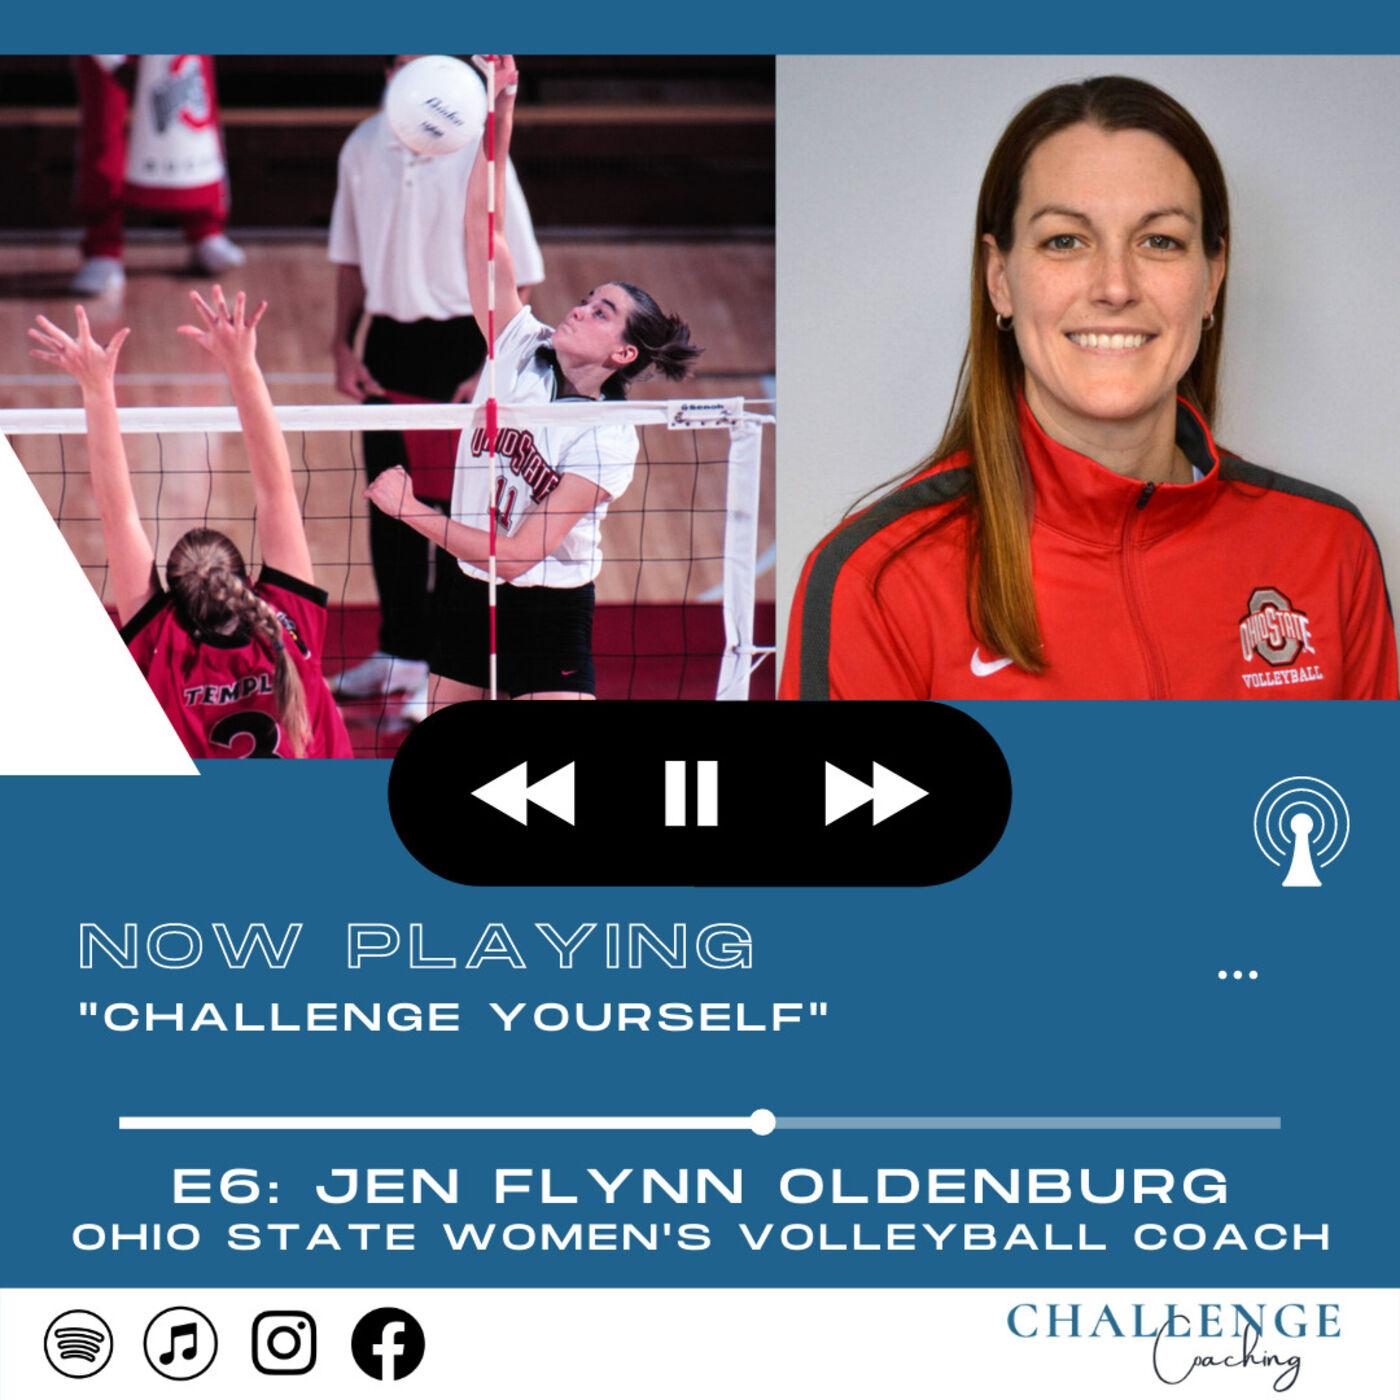 E6: Jen Flynn Oldenburg: The Ohio State Women's Volleyball Coach